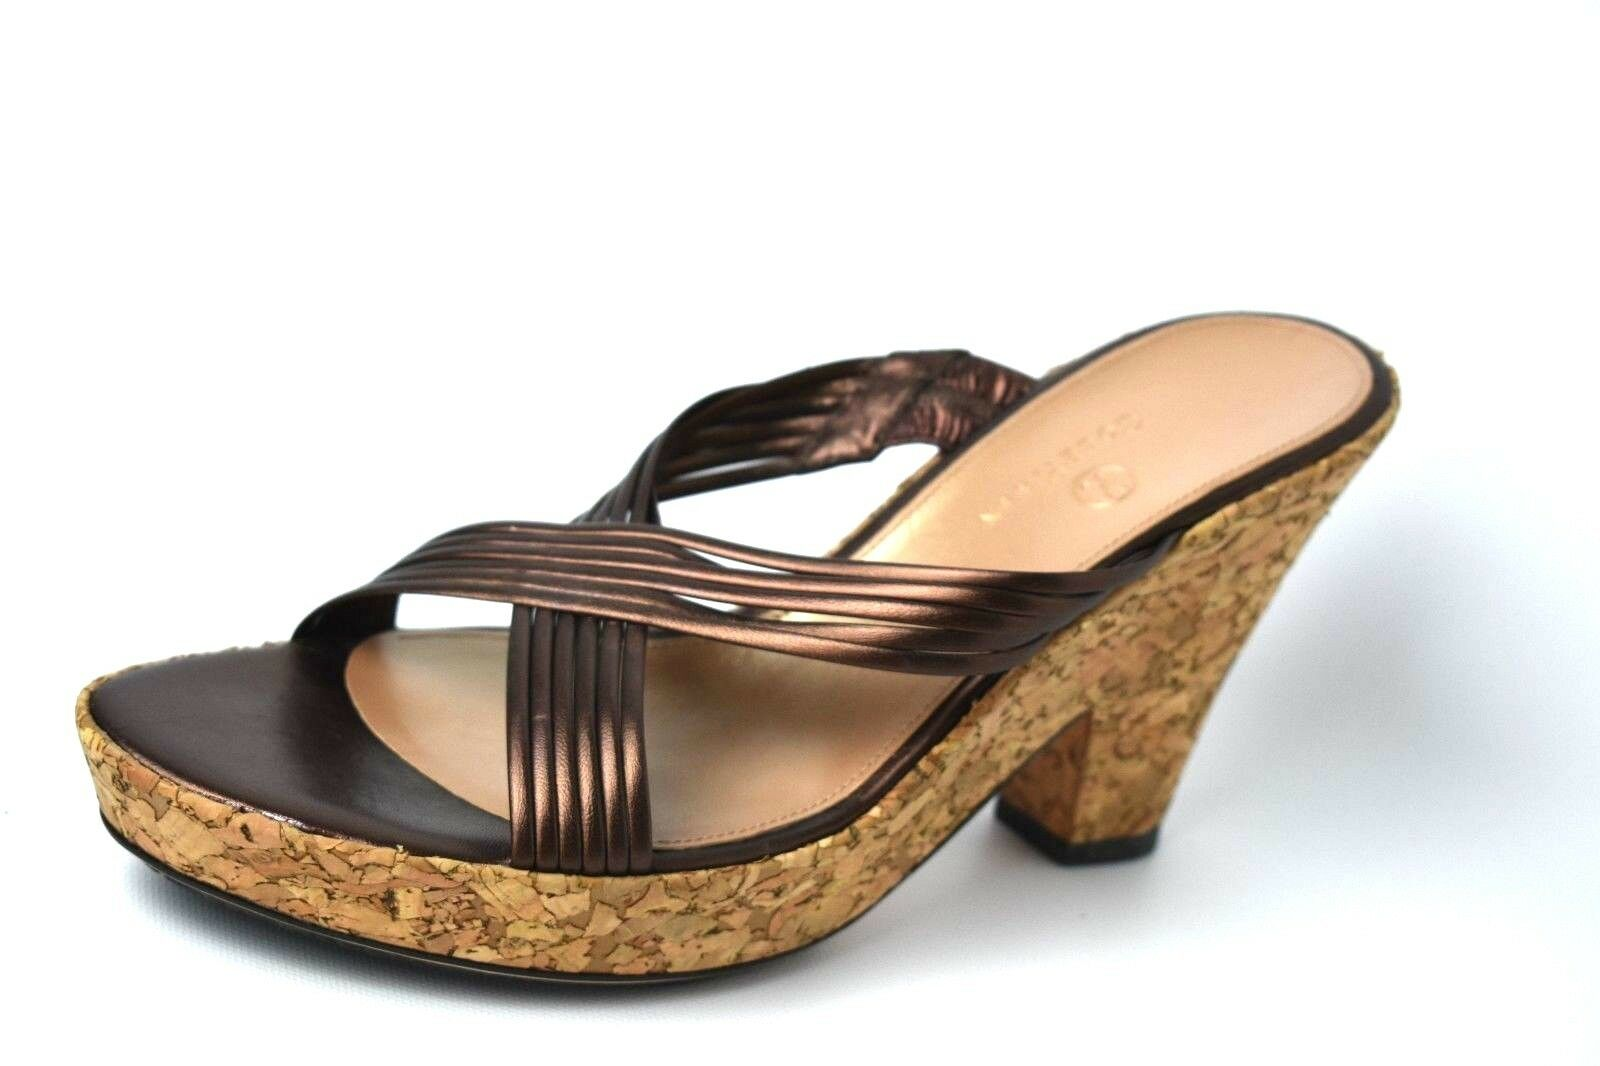 NIB Cole HaanCARLEIGH SLIDE DK CHOC  Metallic Sandal SZ 9.5 B